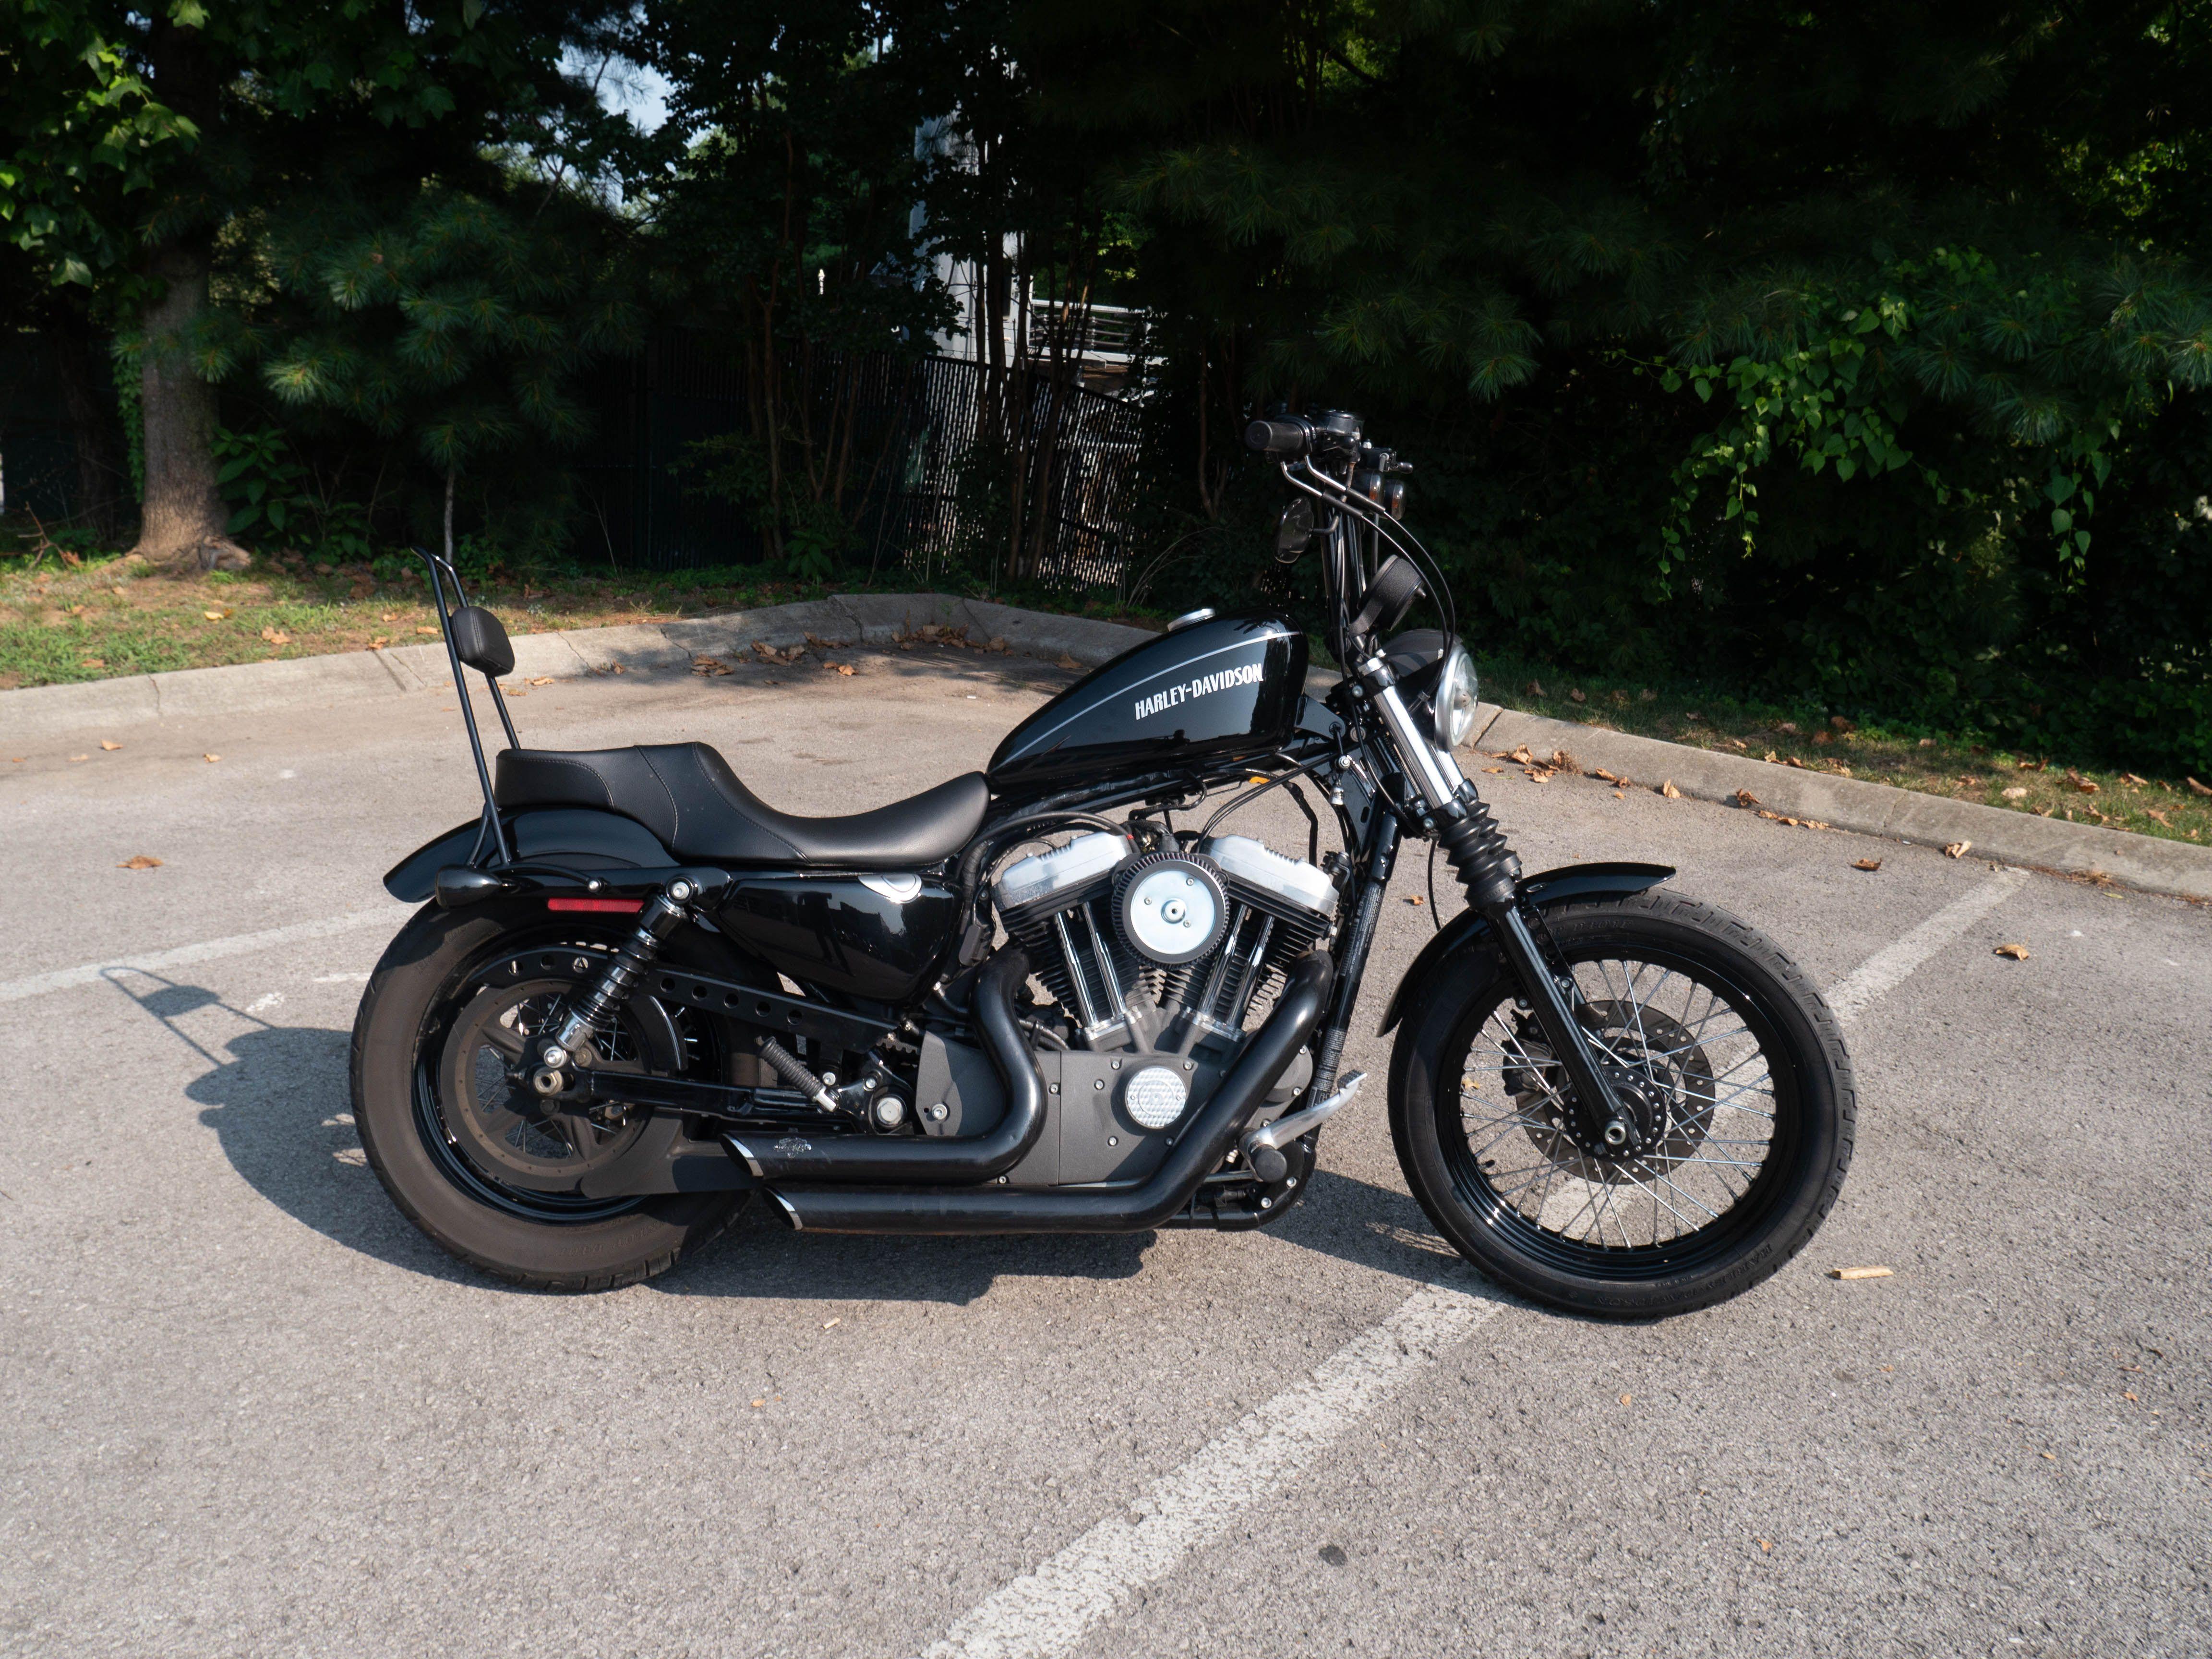 Pre-Owned 2011 Harley-Davidson 1200 Nightster